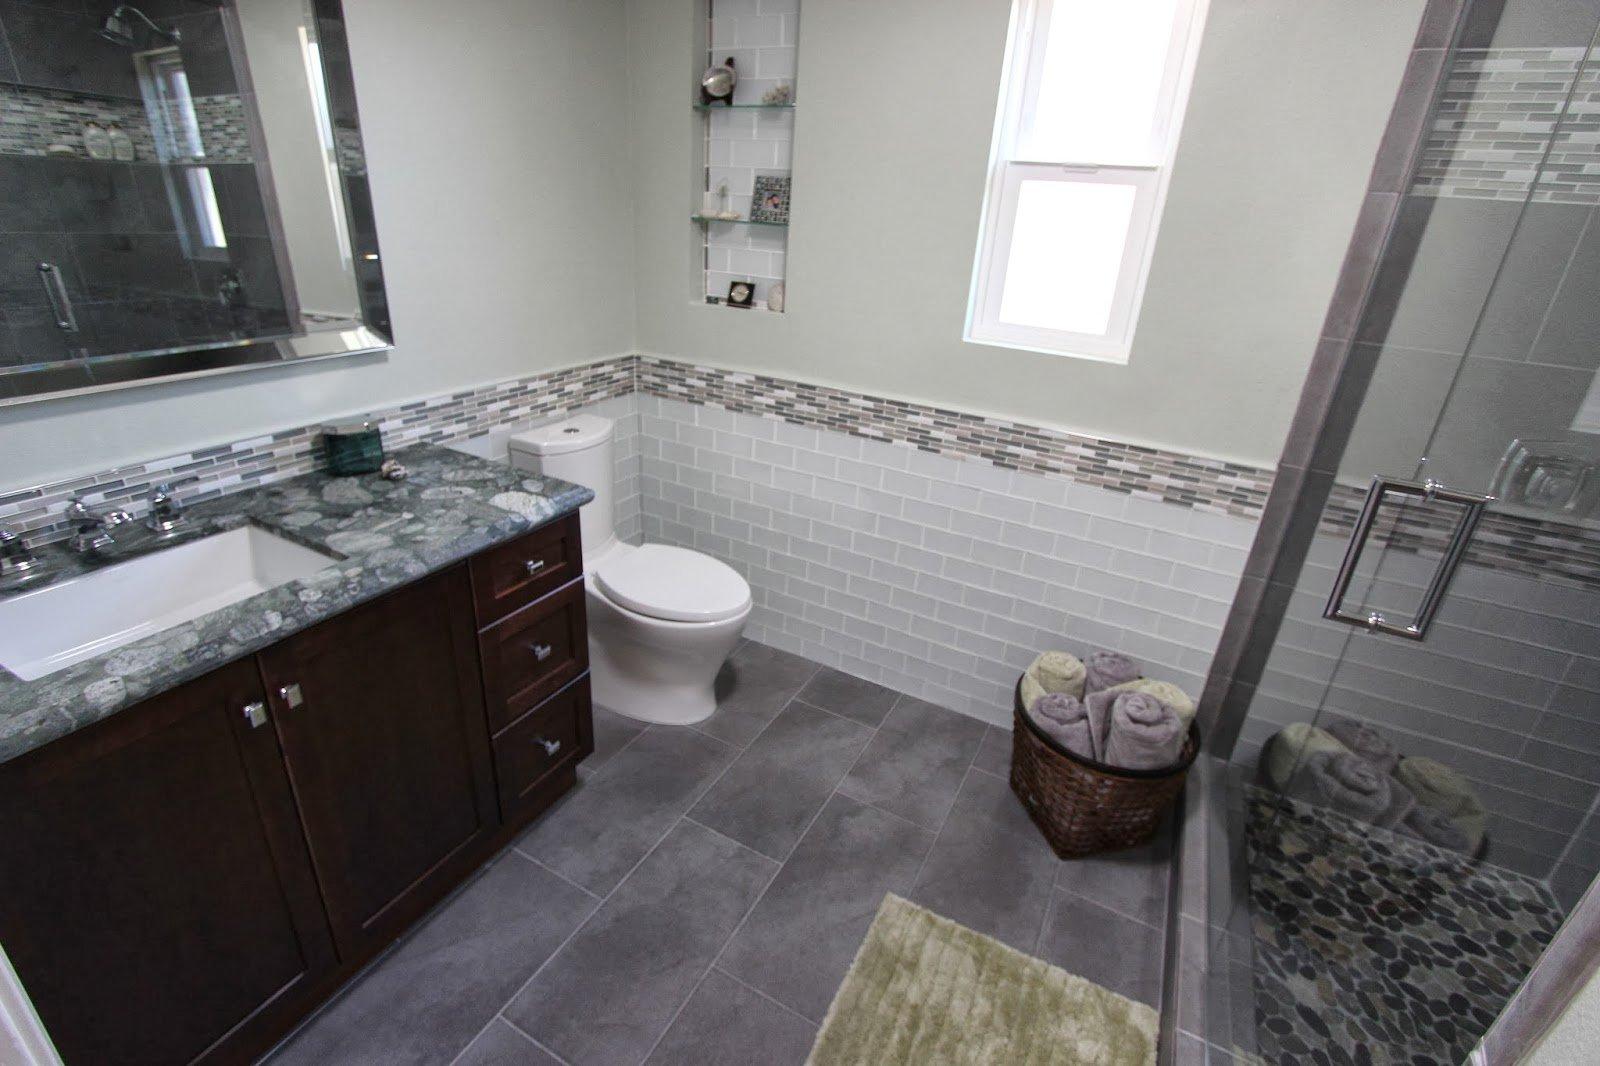 Brightening a Small Bathroom Complete Bathroom Remodel in San Diego, CA, San Diego CA   Over 25 ...